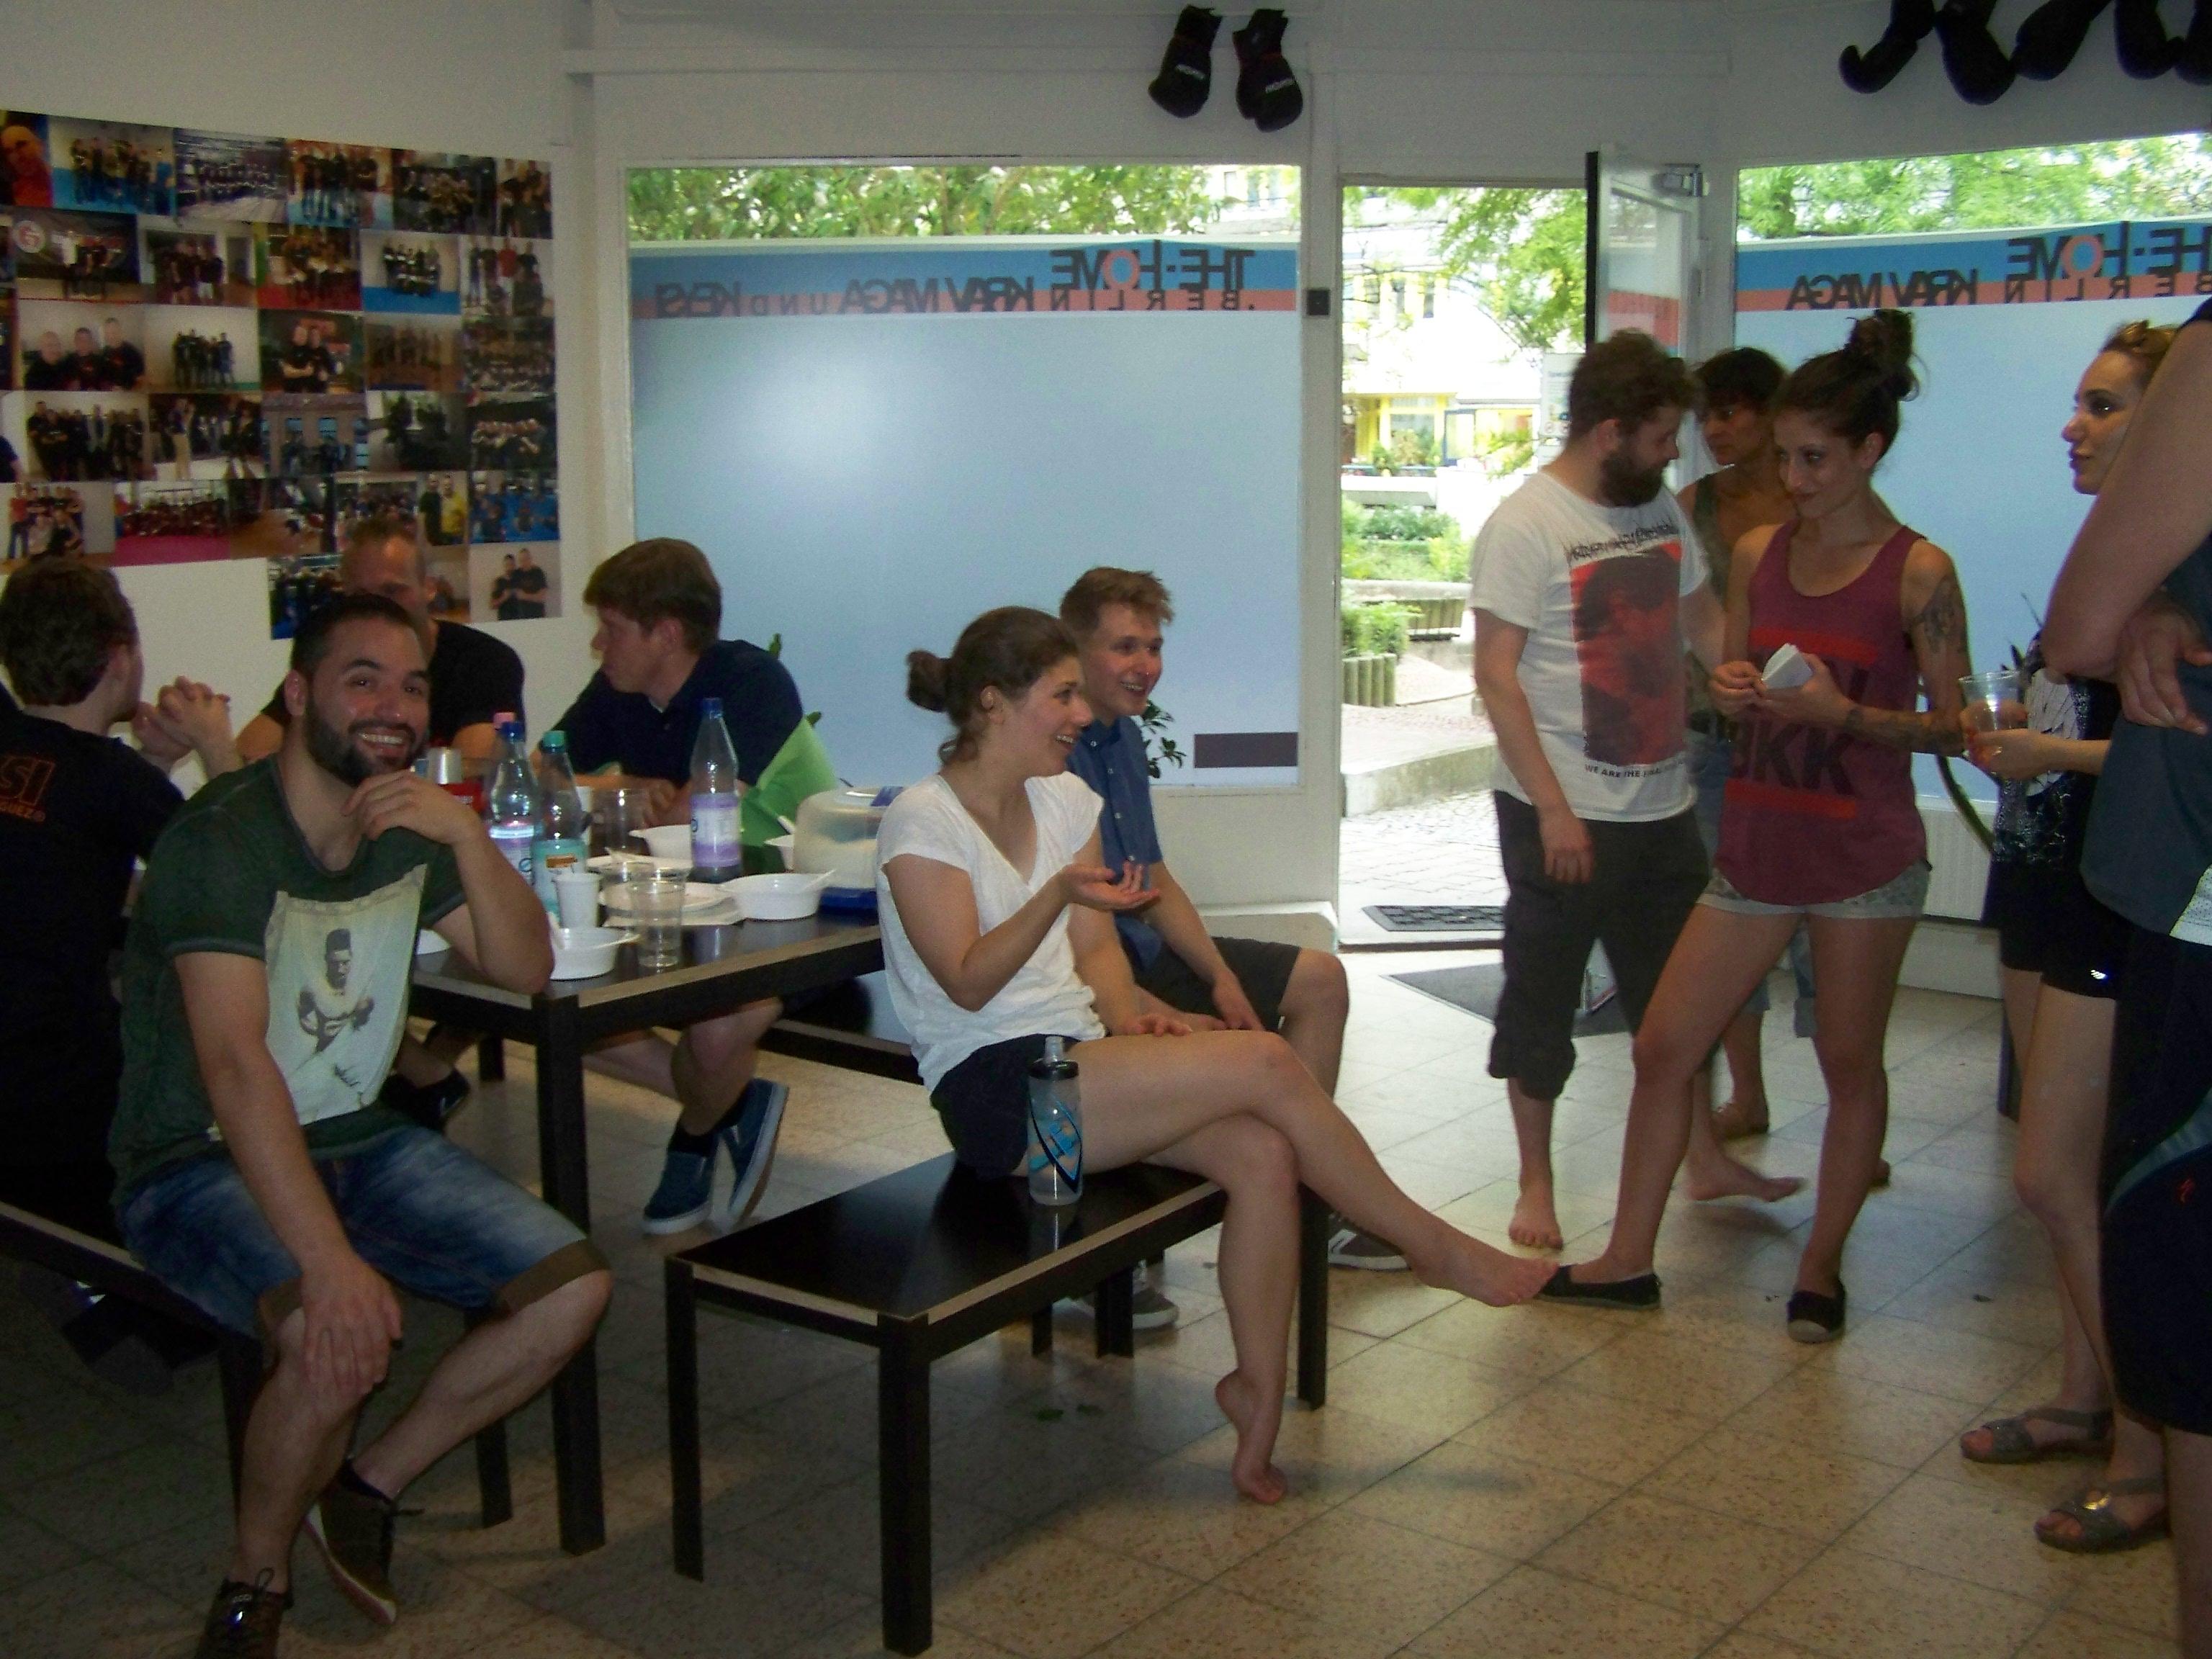 Besuch aus Hamburg-Altona bei den HOMIES - Krav Maga und Keysi